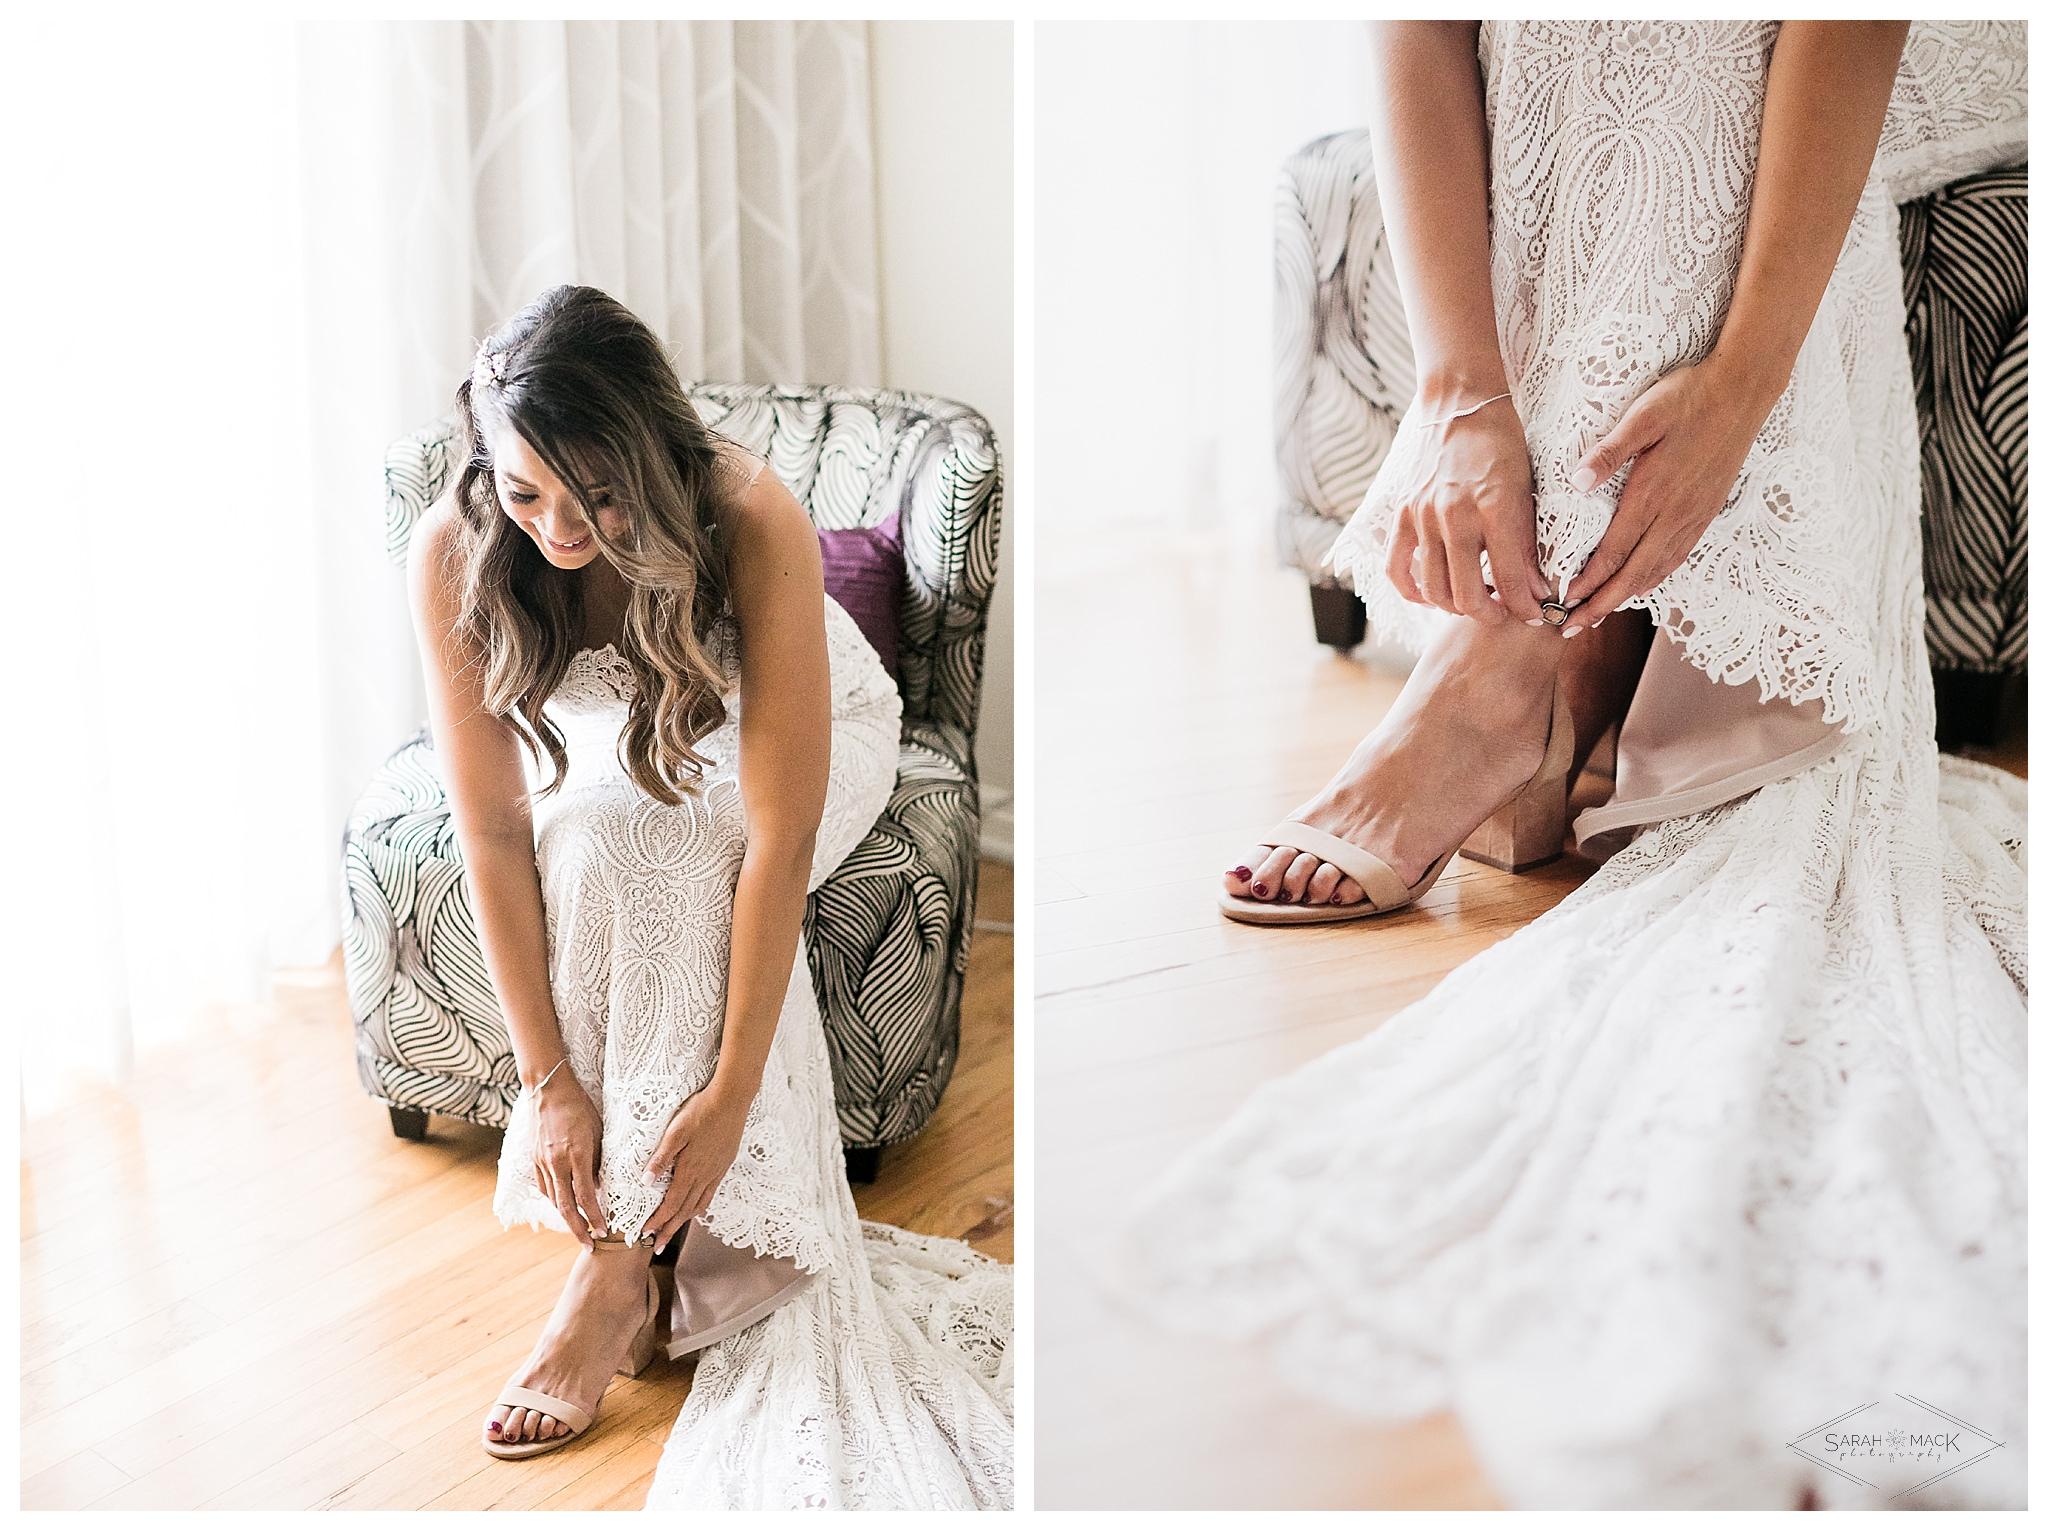 LE-Avenue-of-the-Arts-Costa-Mesa-Wedding-Photography-0039.jpg